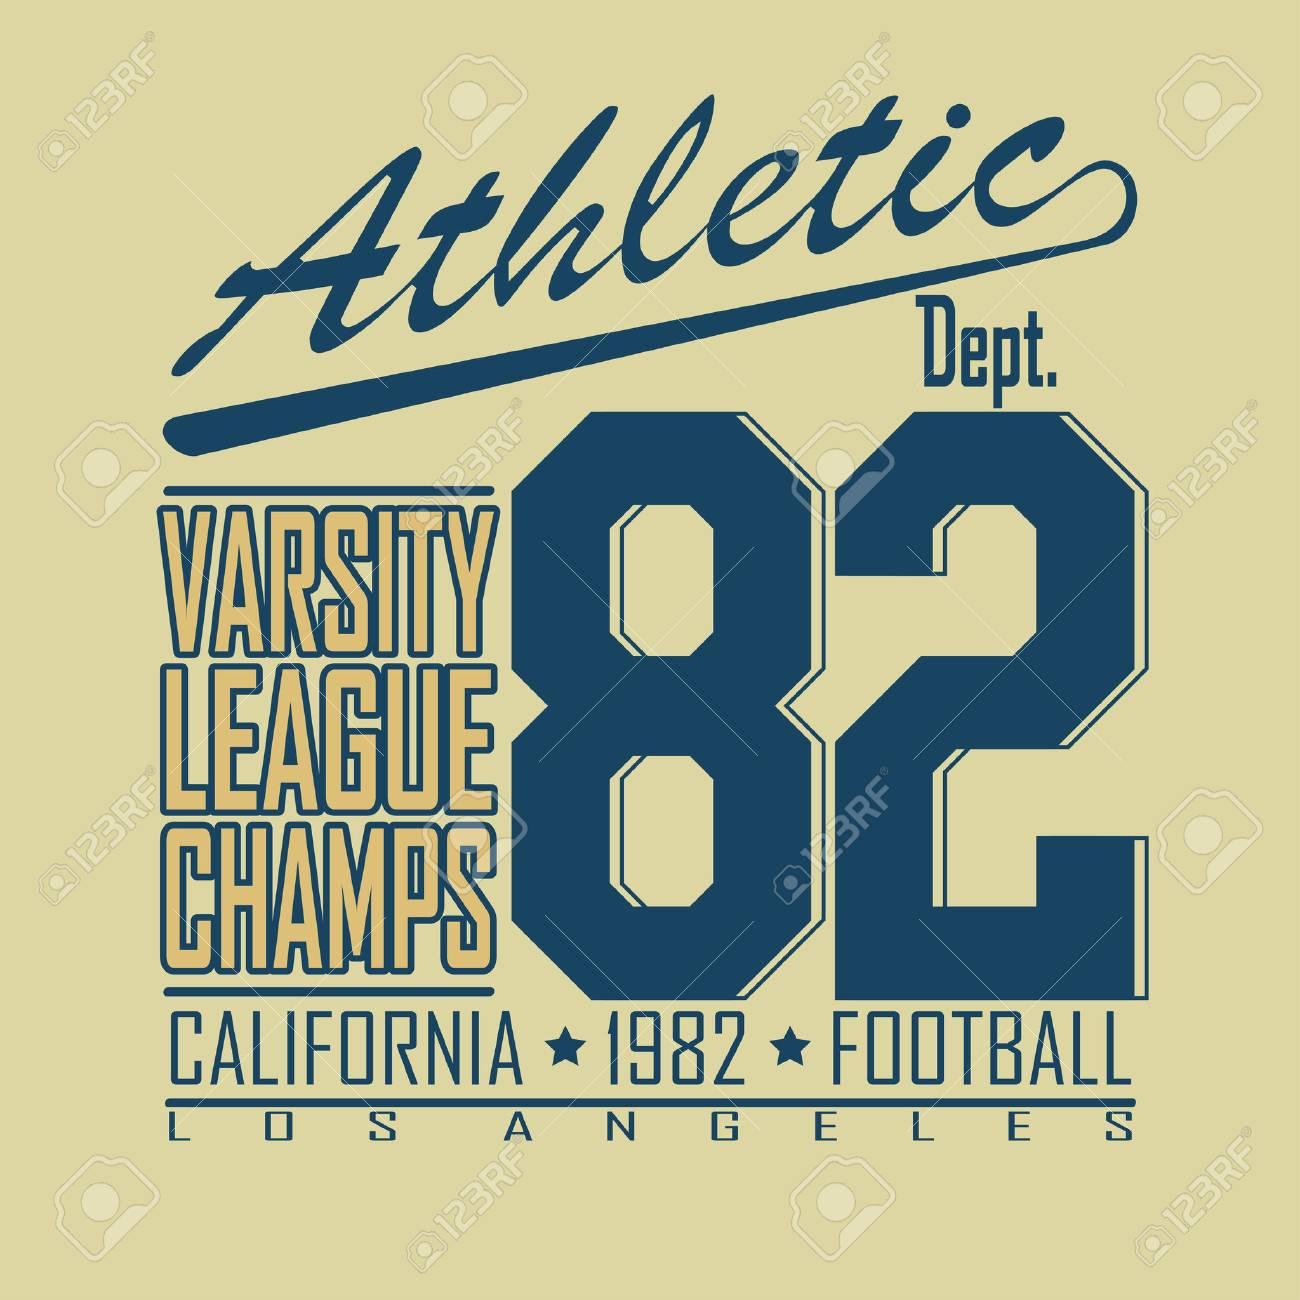 e0a31a88e California Sport Typography, Varsity Football Athletic Dept. T-shirt  fashion design graphics,